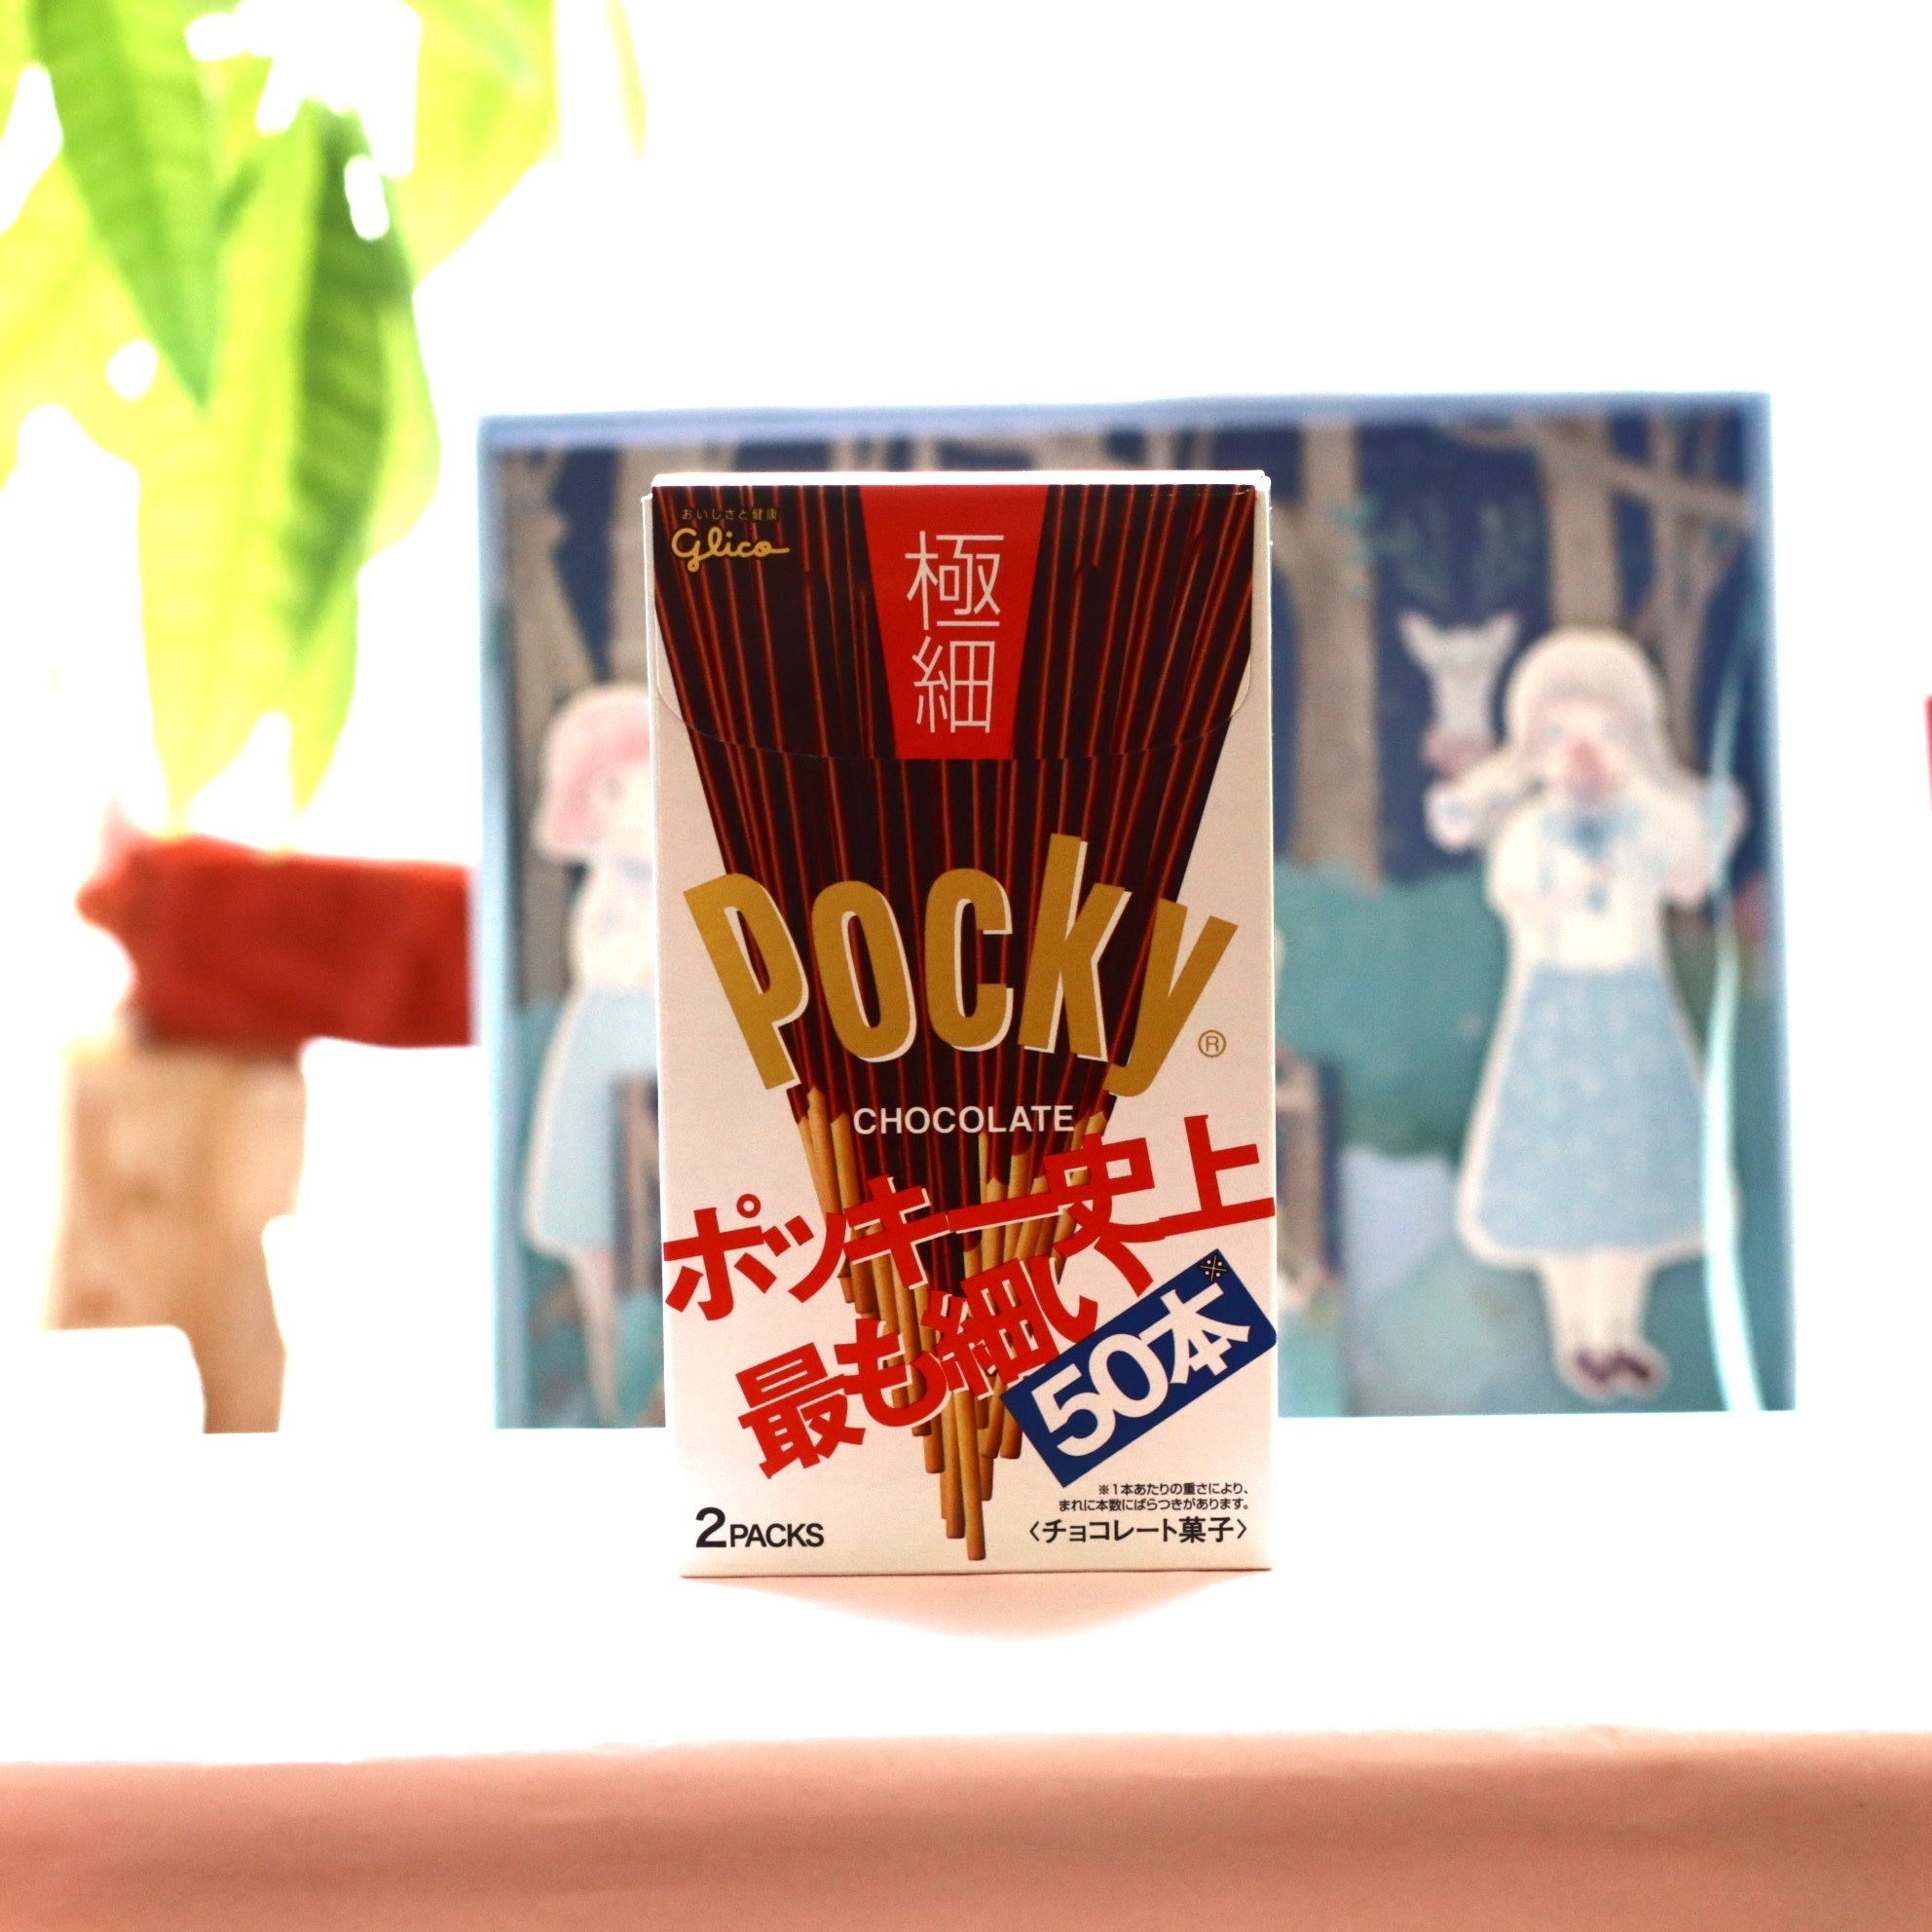 GLICO Pocky- Thin Chocolate